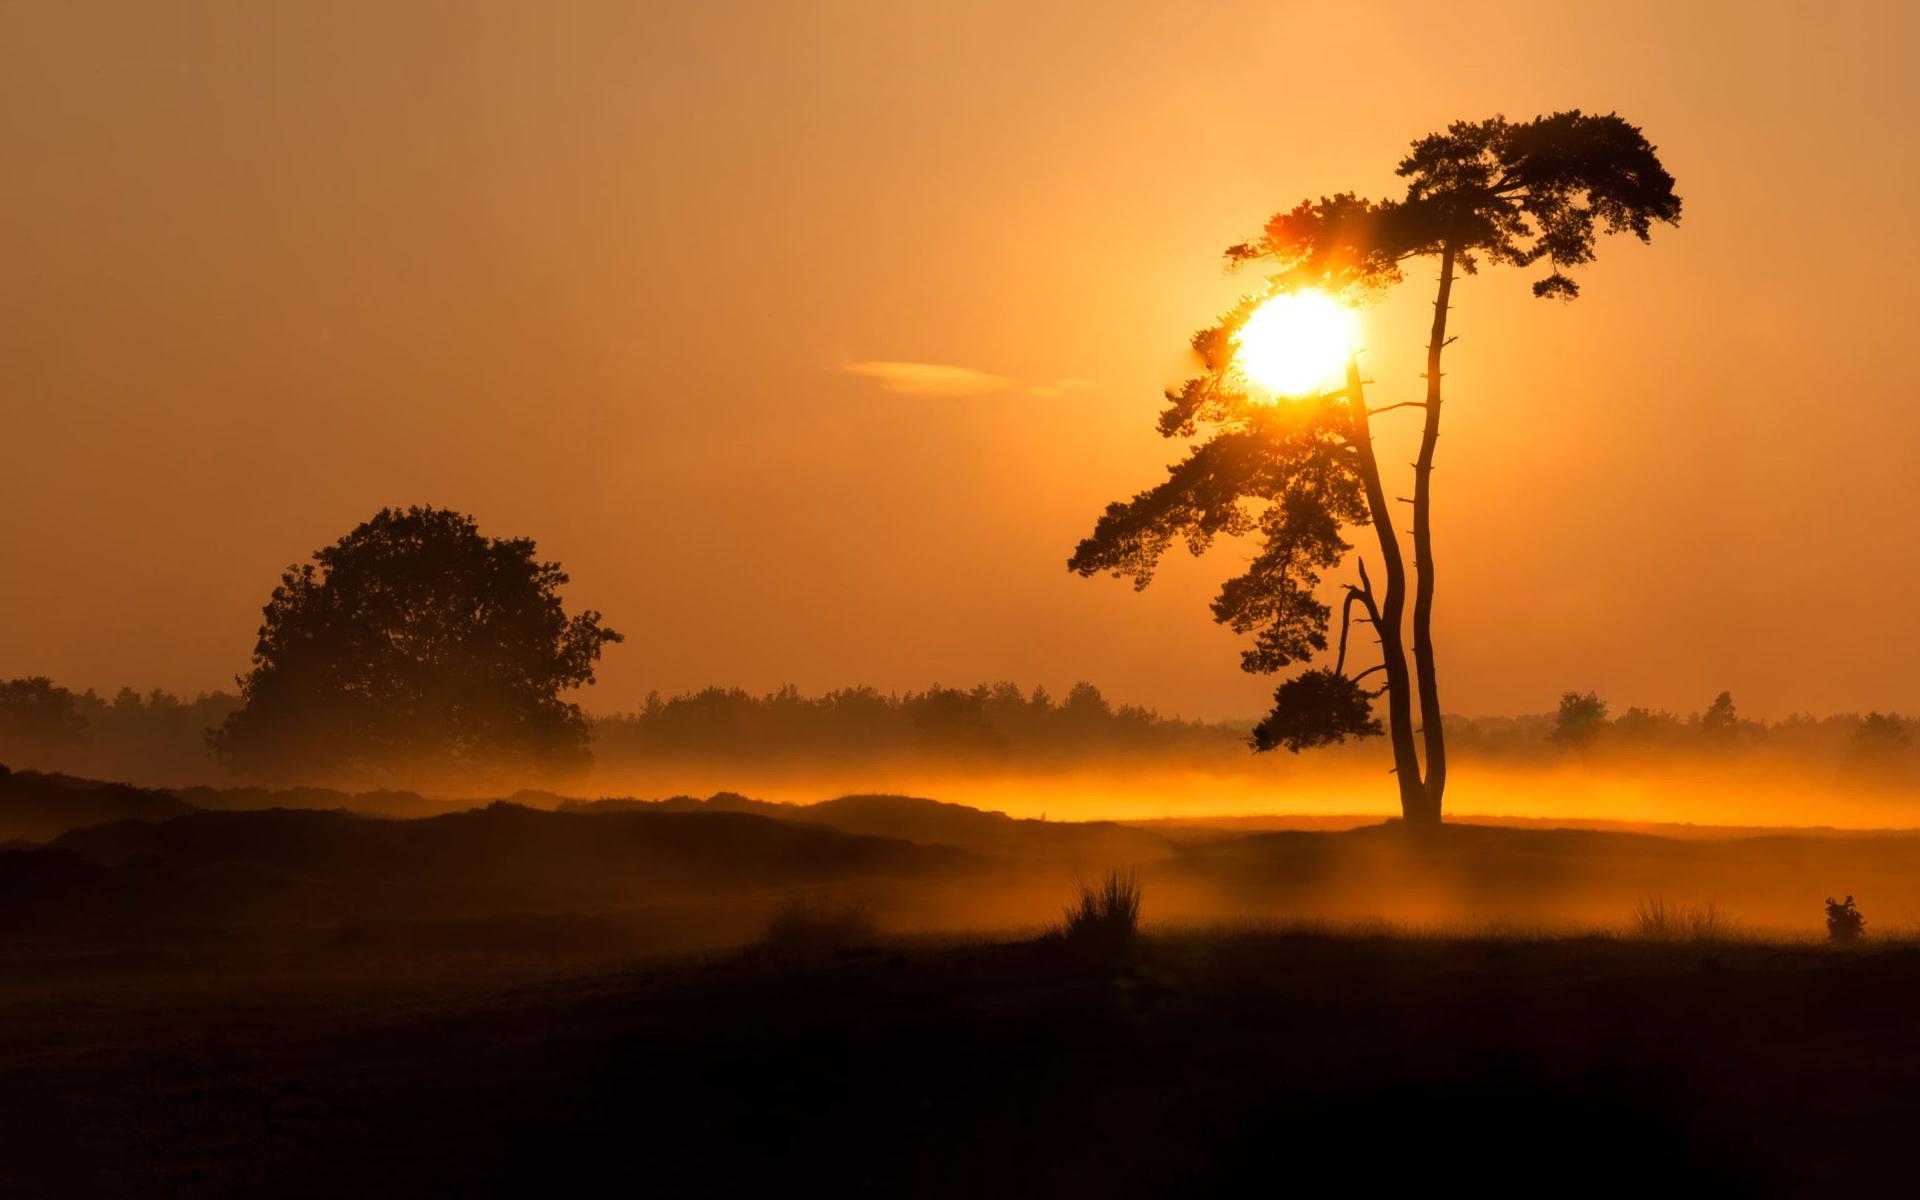 Evening foggy sunset